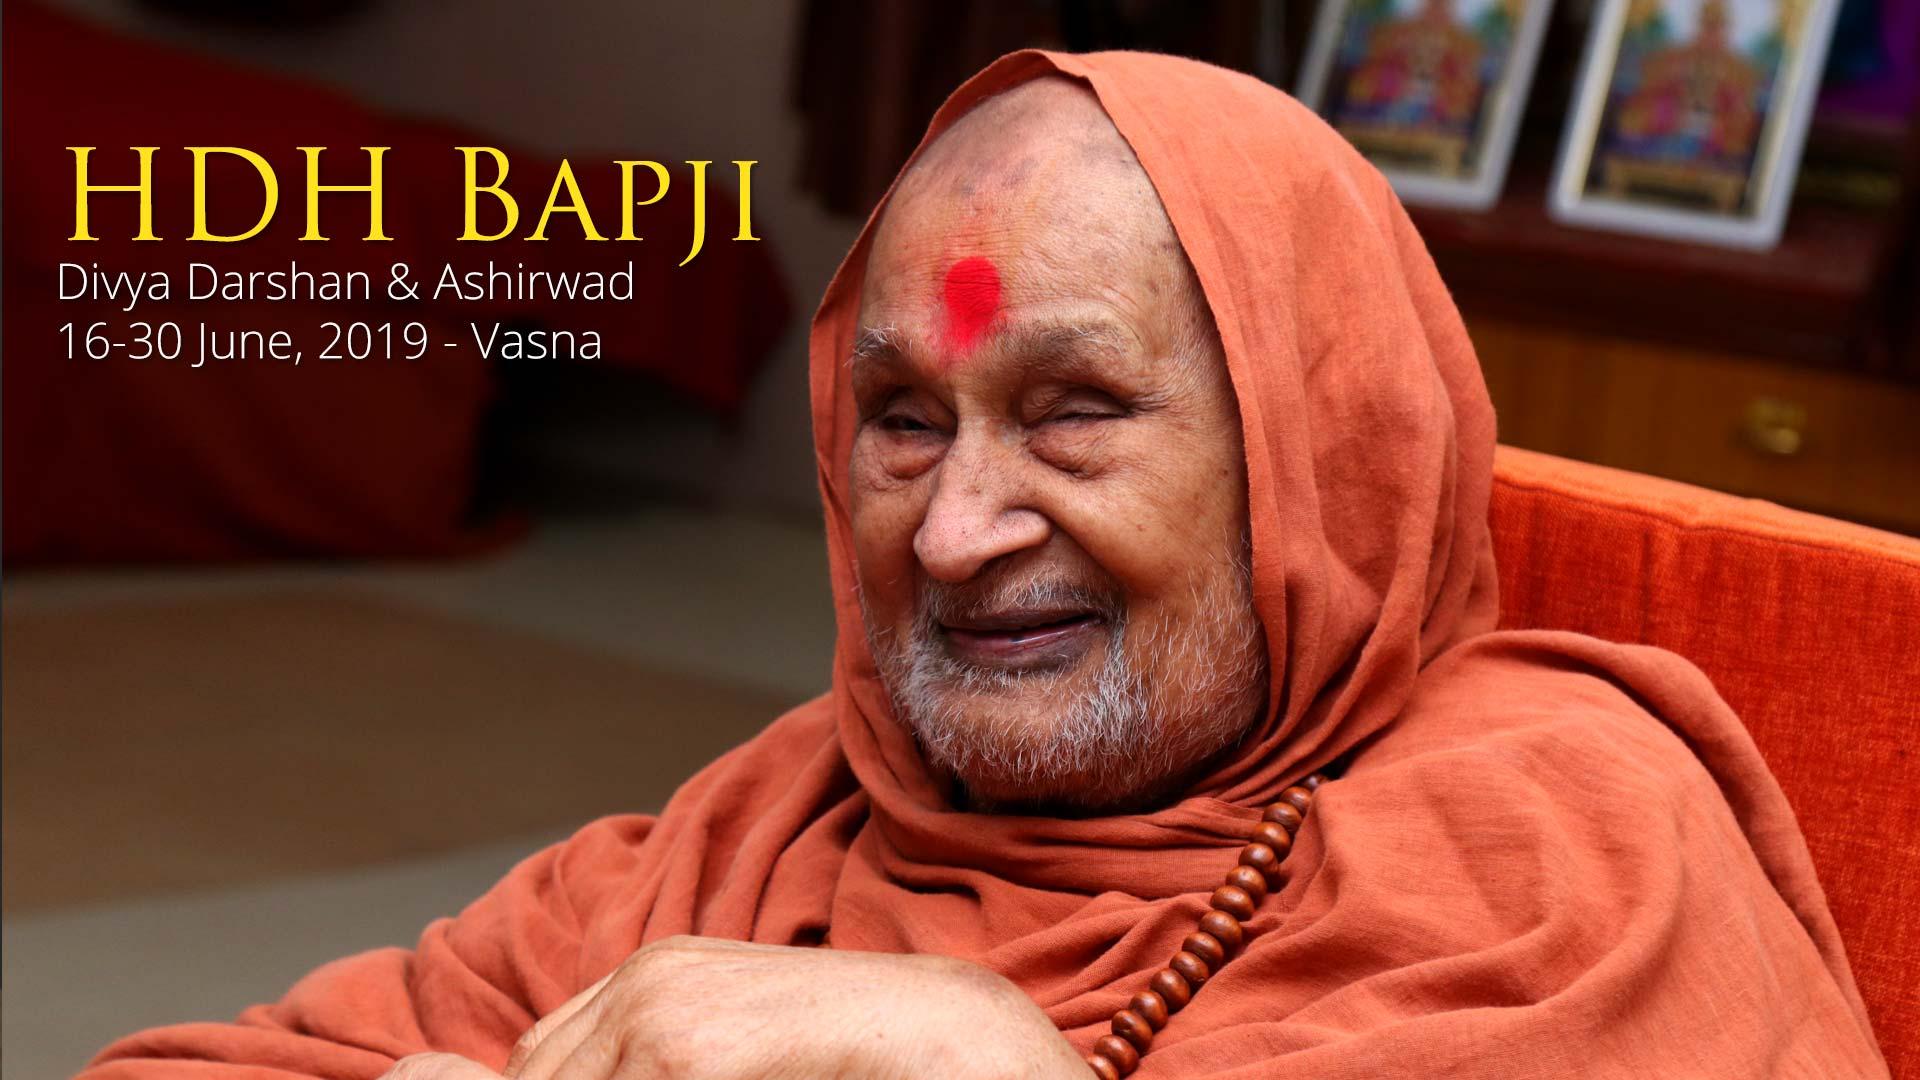 HDH Bapji Divya Darshan-Ashirwad | 16 to 30 June, 2019